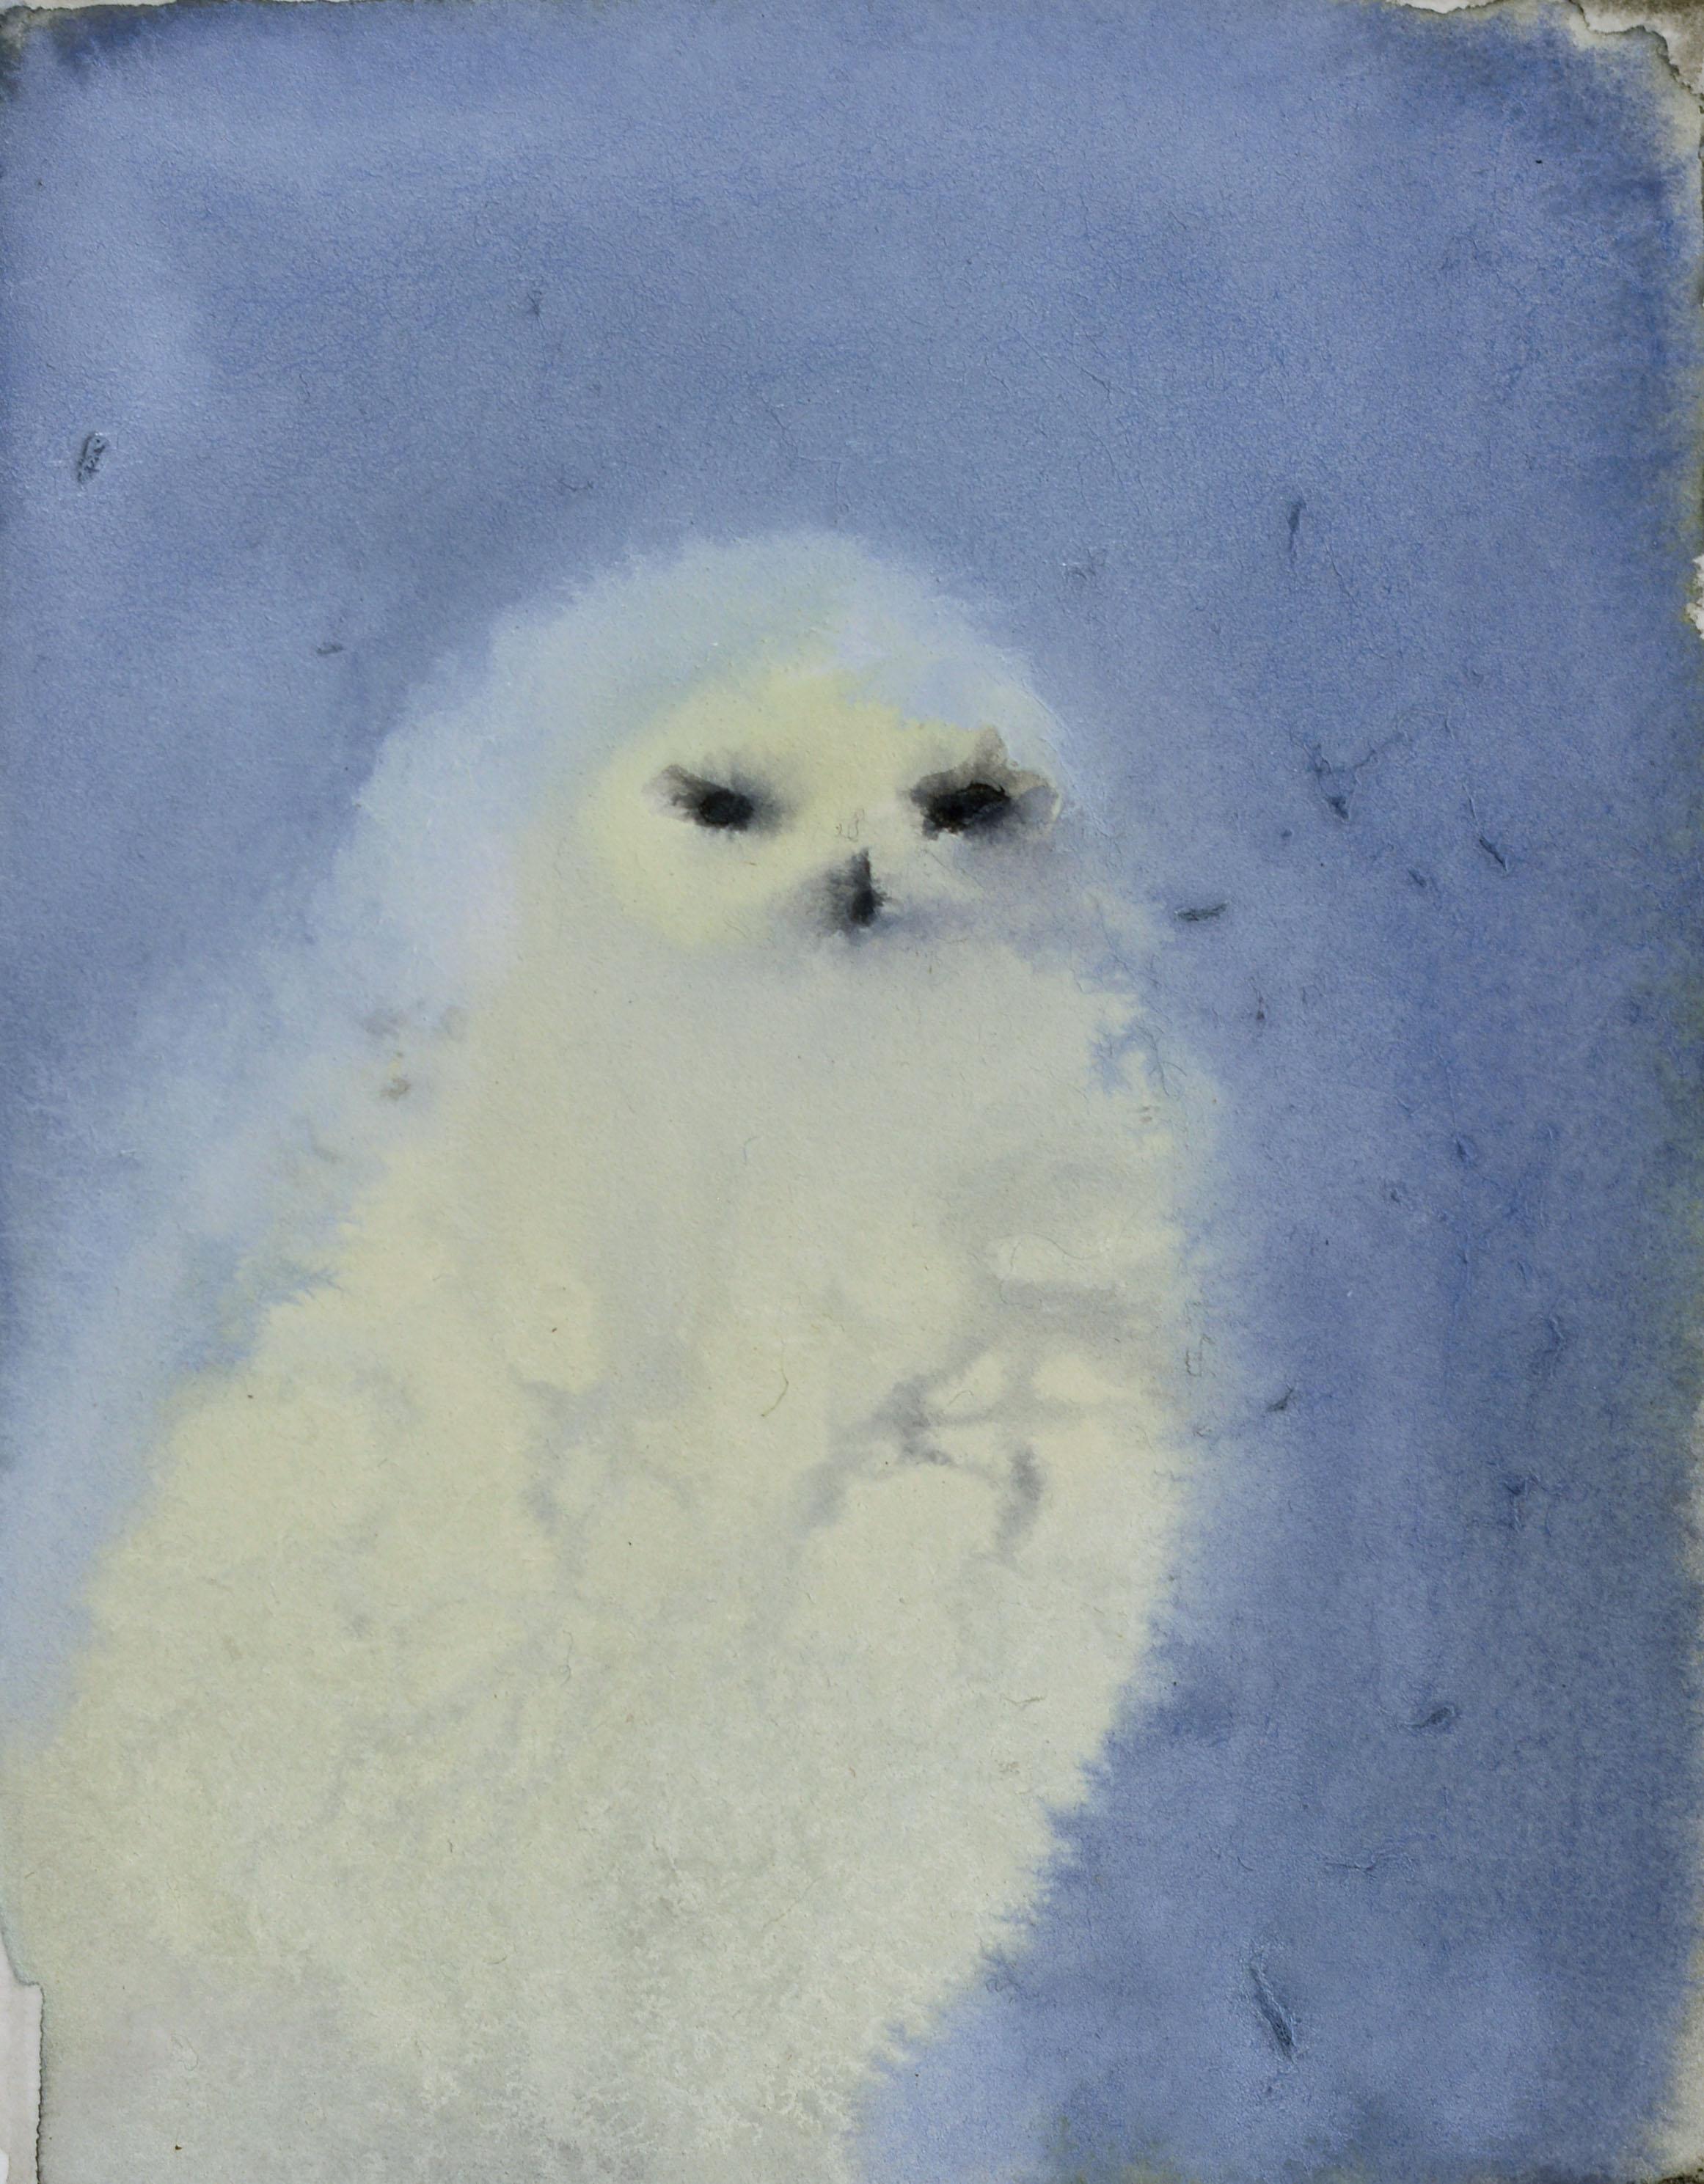 Rebecca_Kinkead_Snowy Owl (on Blue)_4x3 inset on 11 x 7.5.jpg